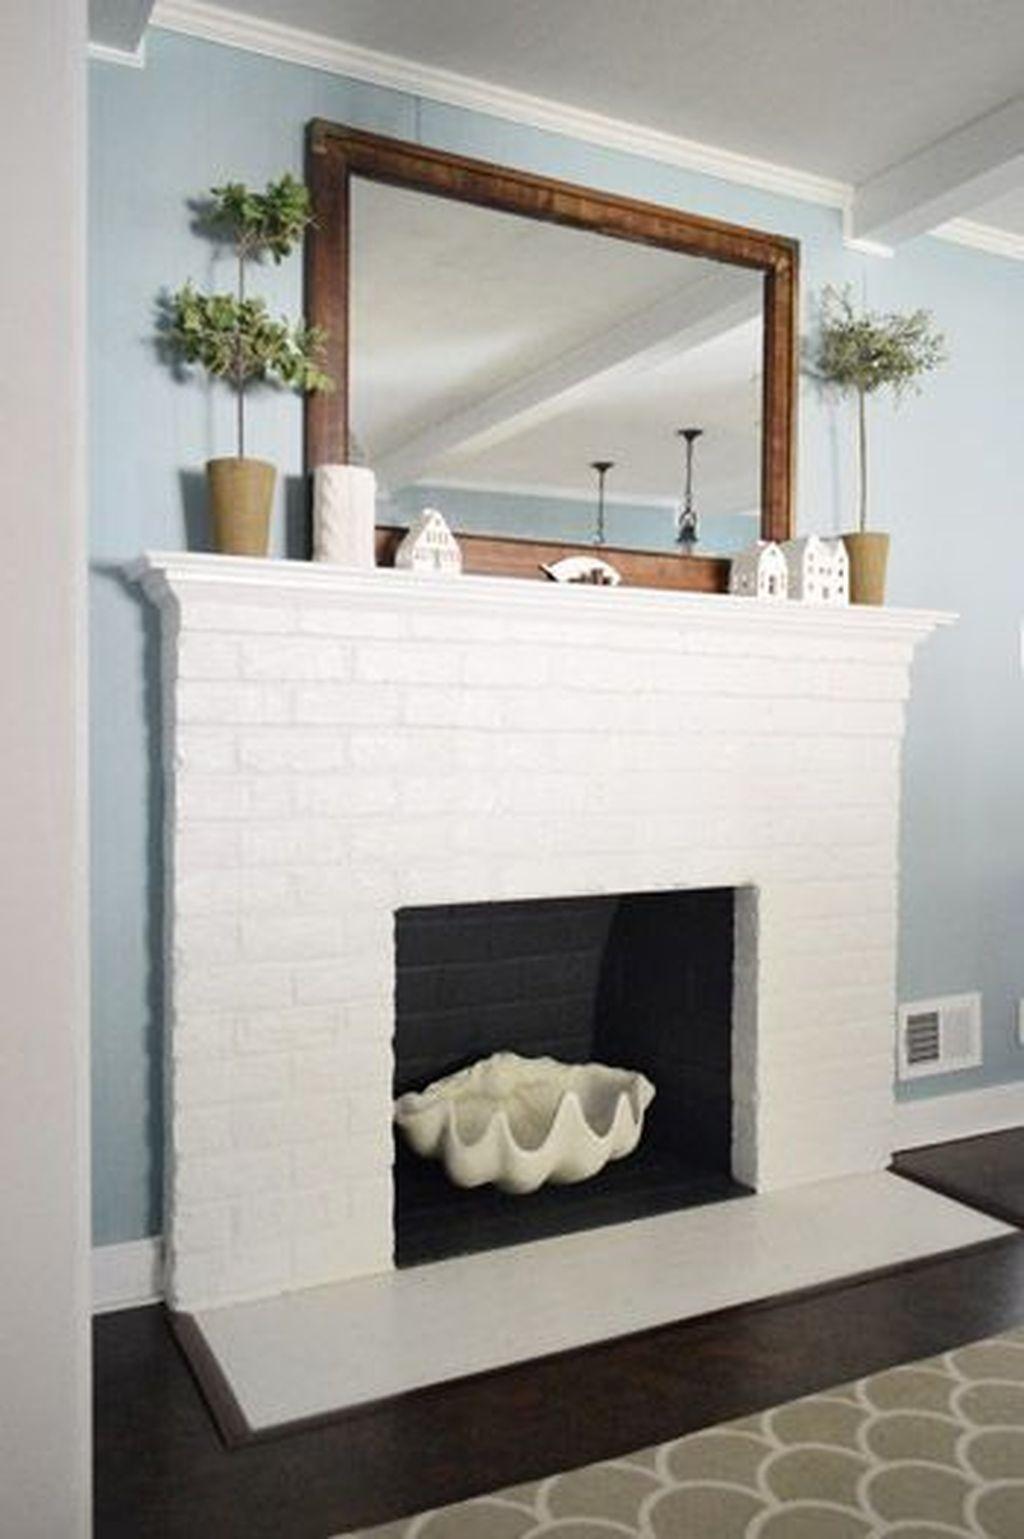 20 simple fireplace makeover for winter ideas home decor rh pinterest com